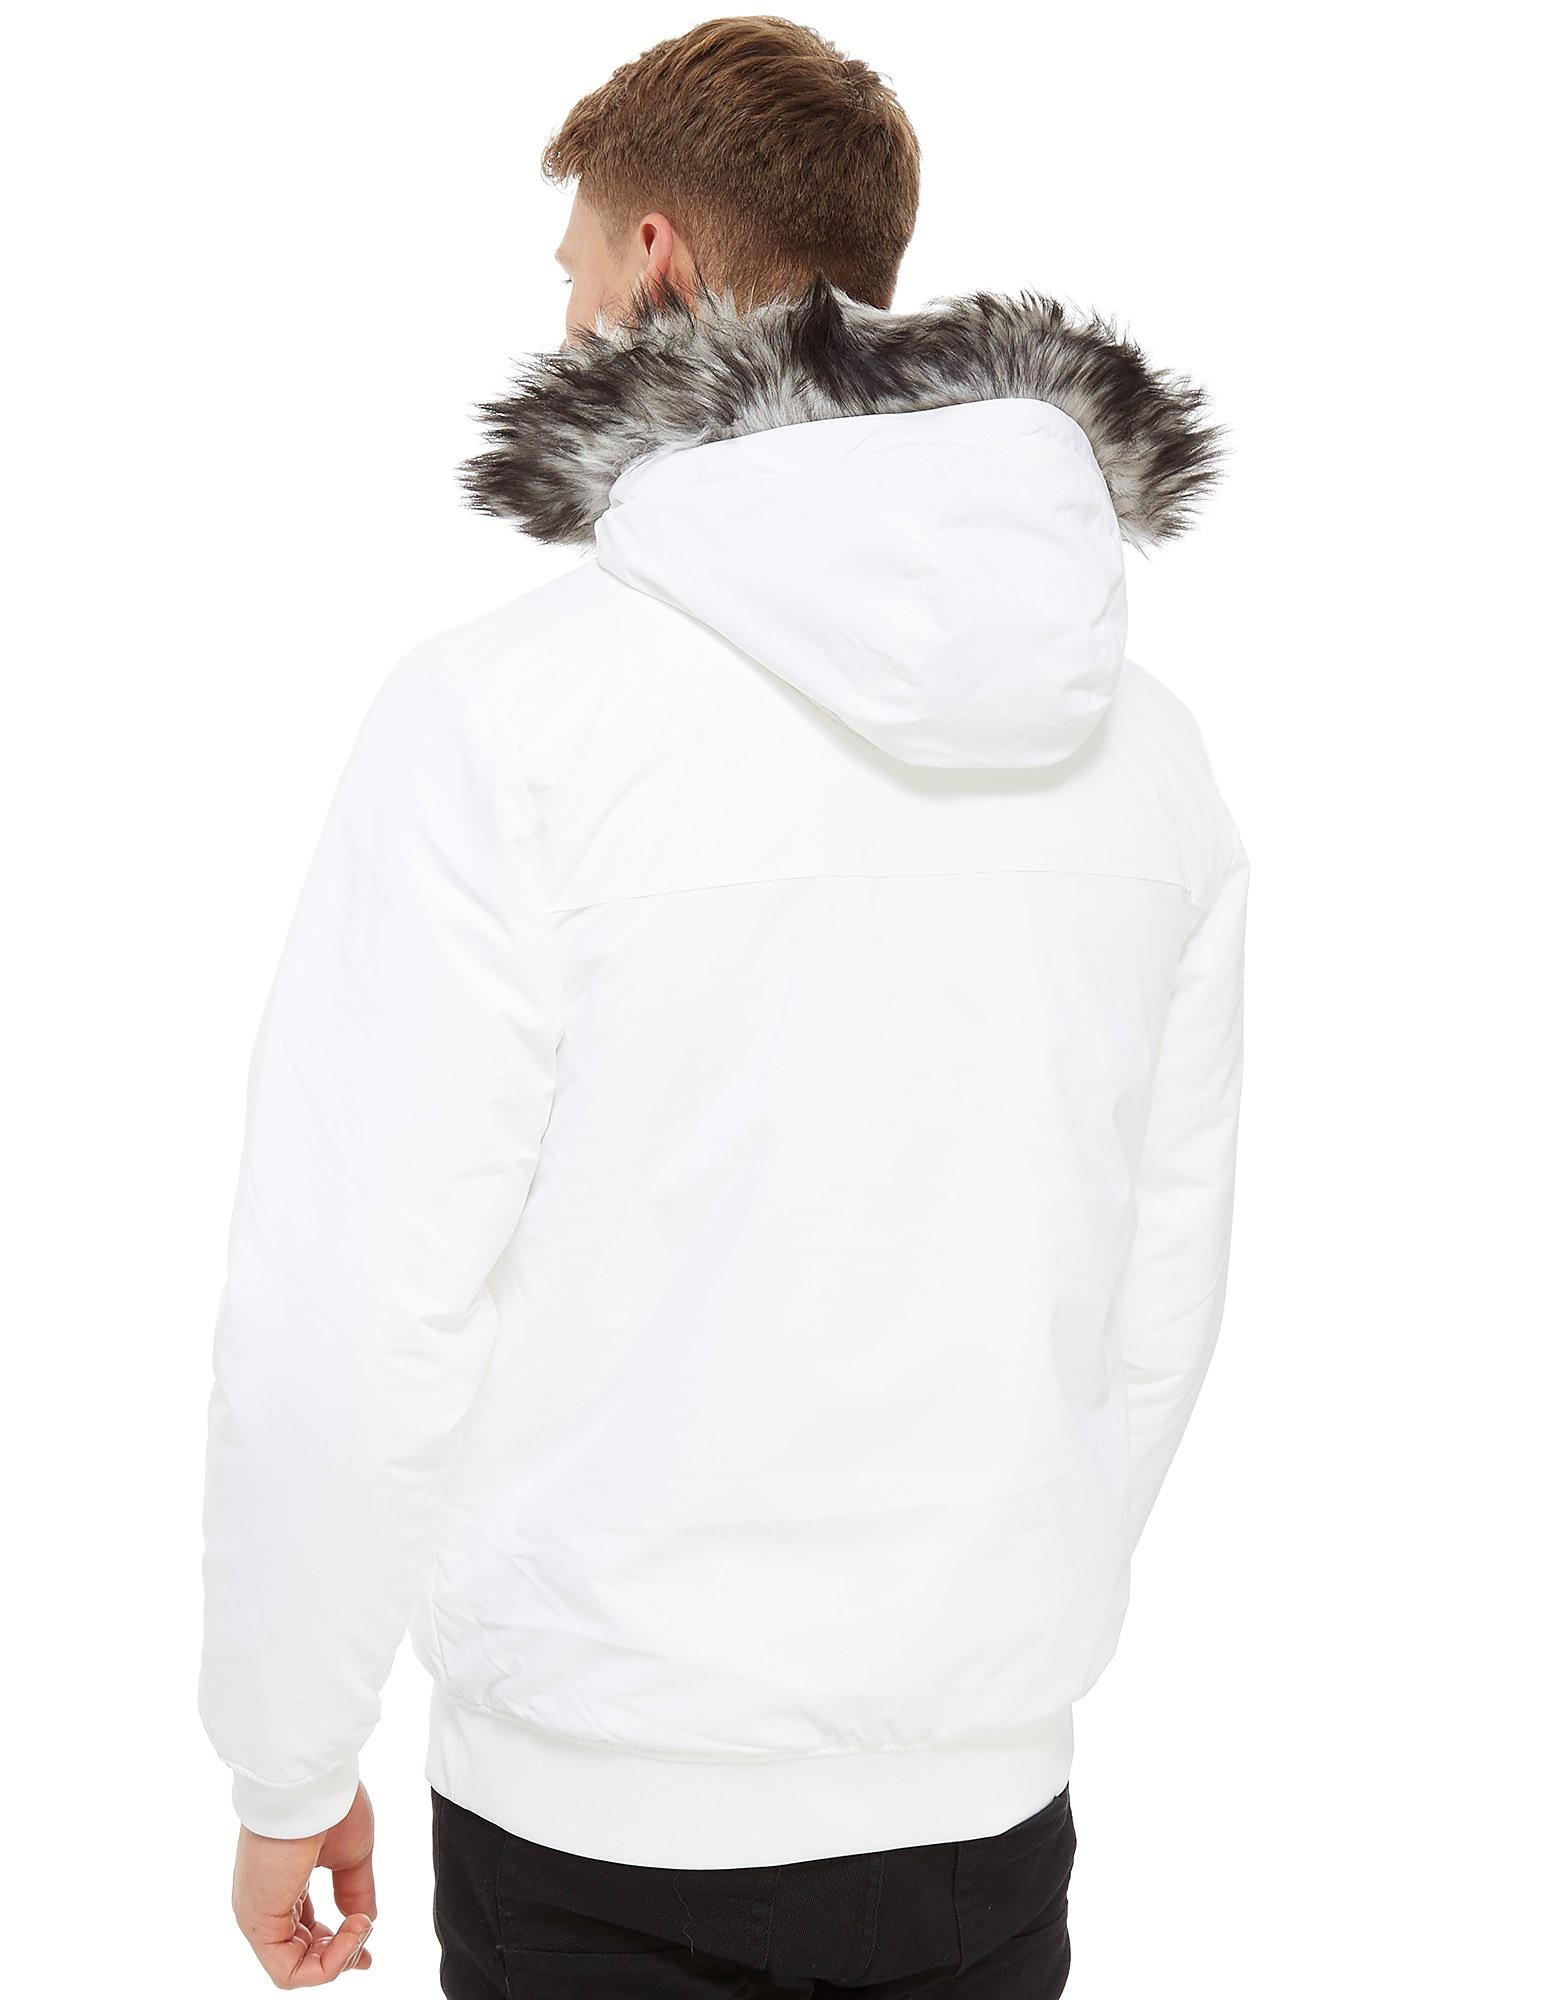 adidas Originals parka Trefoil Fur